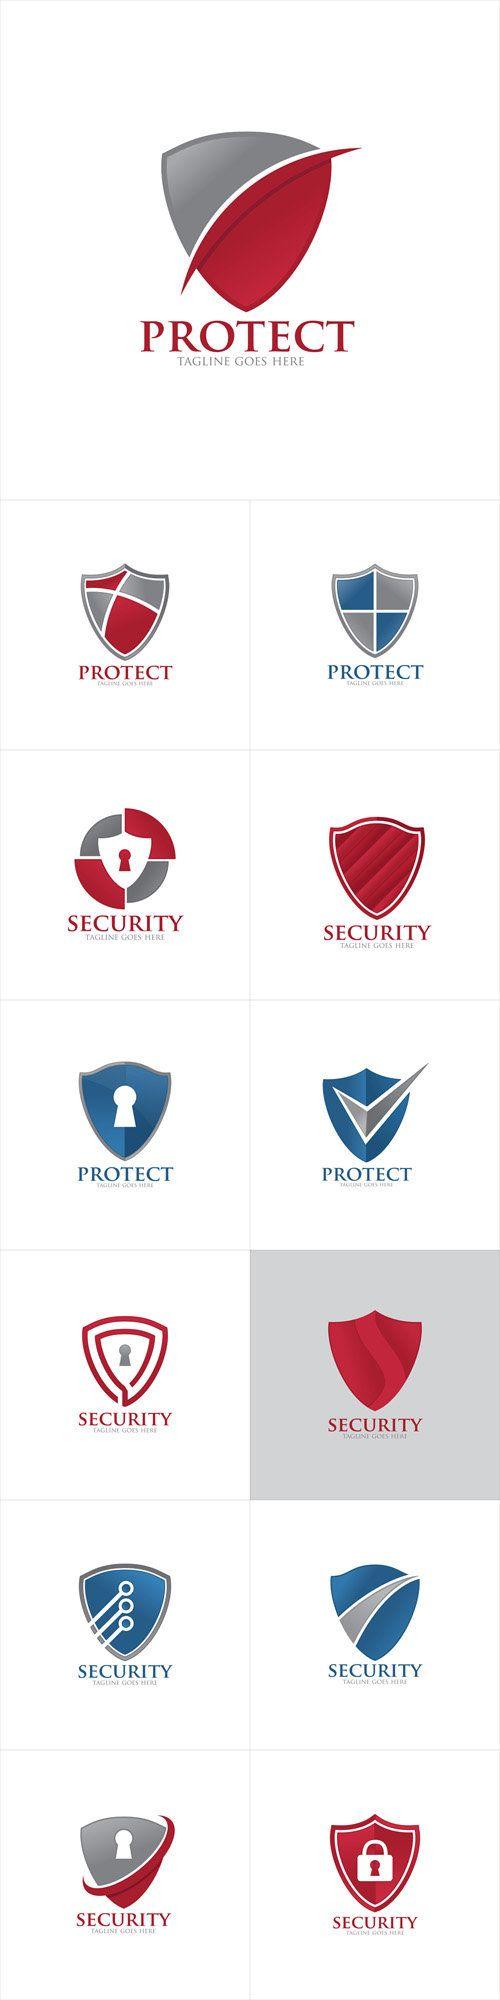 Vectors - Shield Protection Security Logo Icon